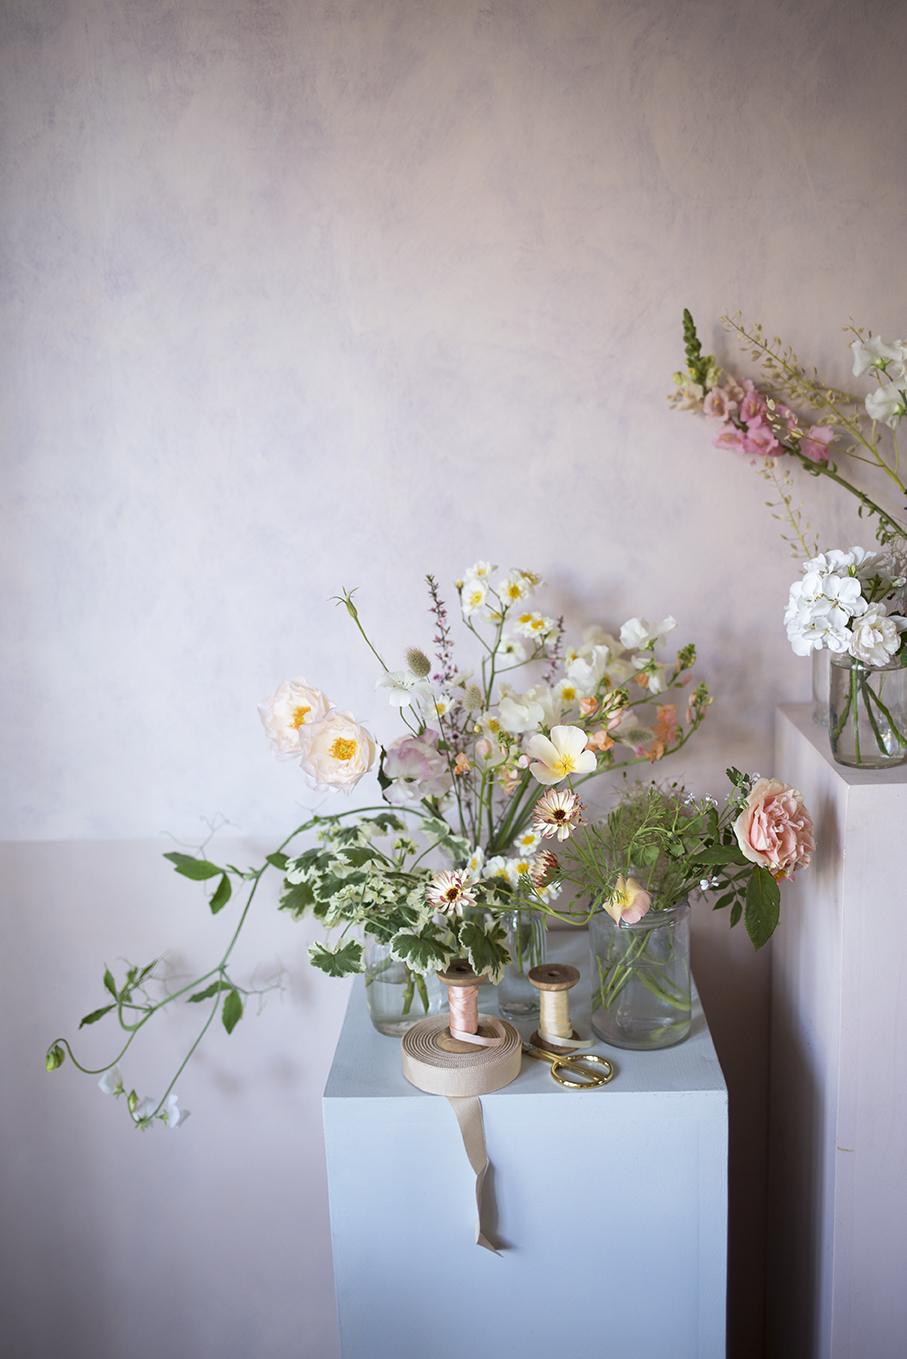 Flowers ready for a bouquet demo at Aesme Flower Studio in Shepherd's Bush